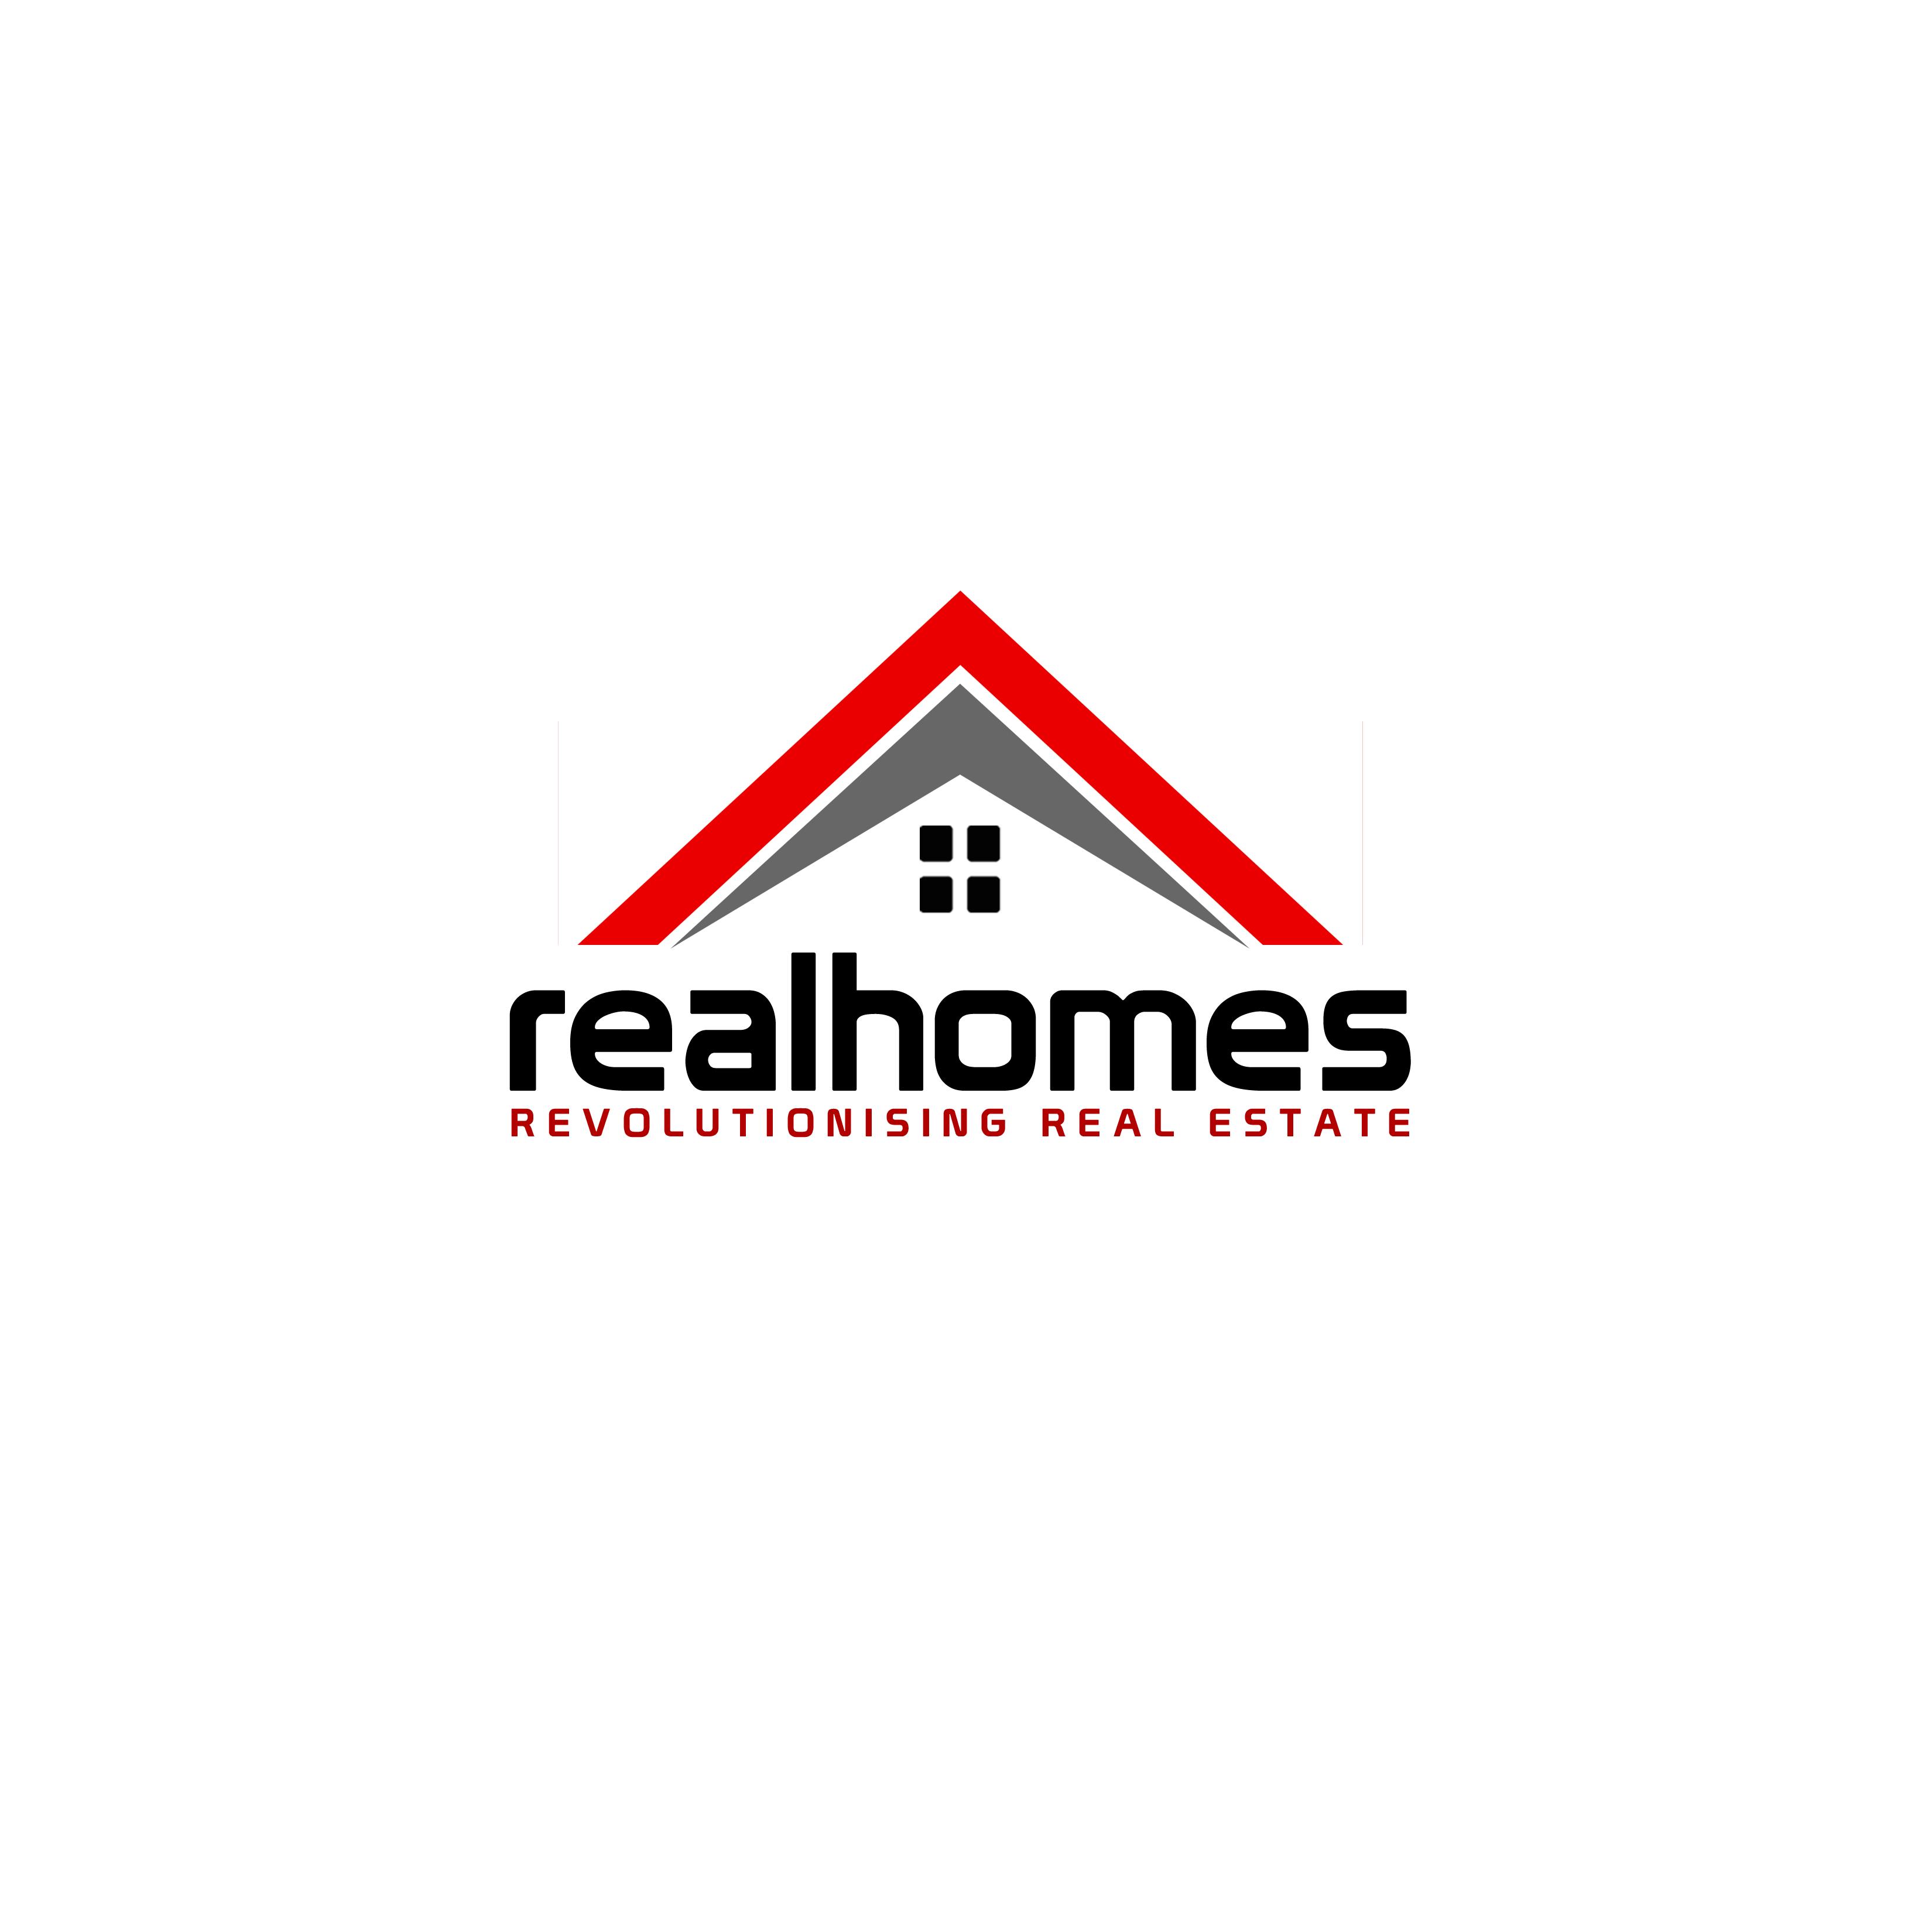 Logo Design by Allan Esclamado - Entry No. 114 in the Logo Design Contest Captivating Logo Design for Real Homes.